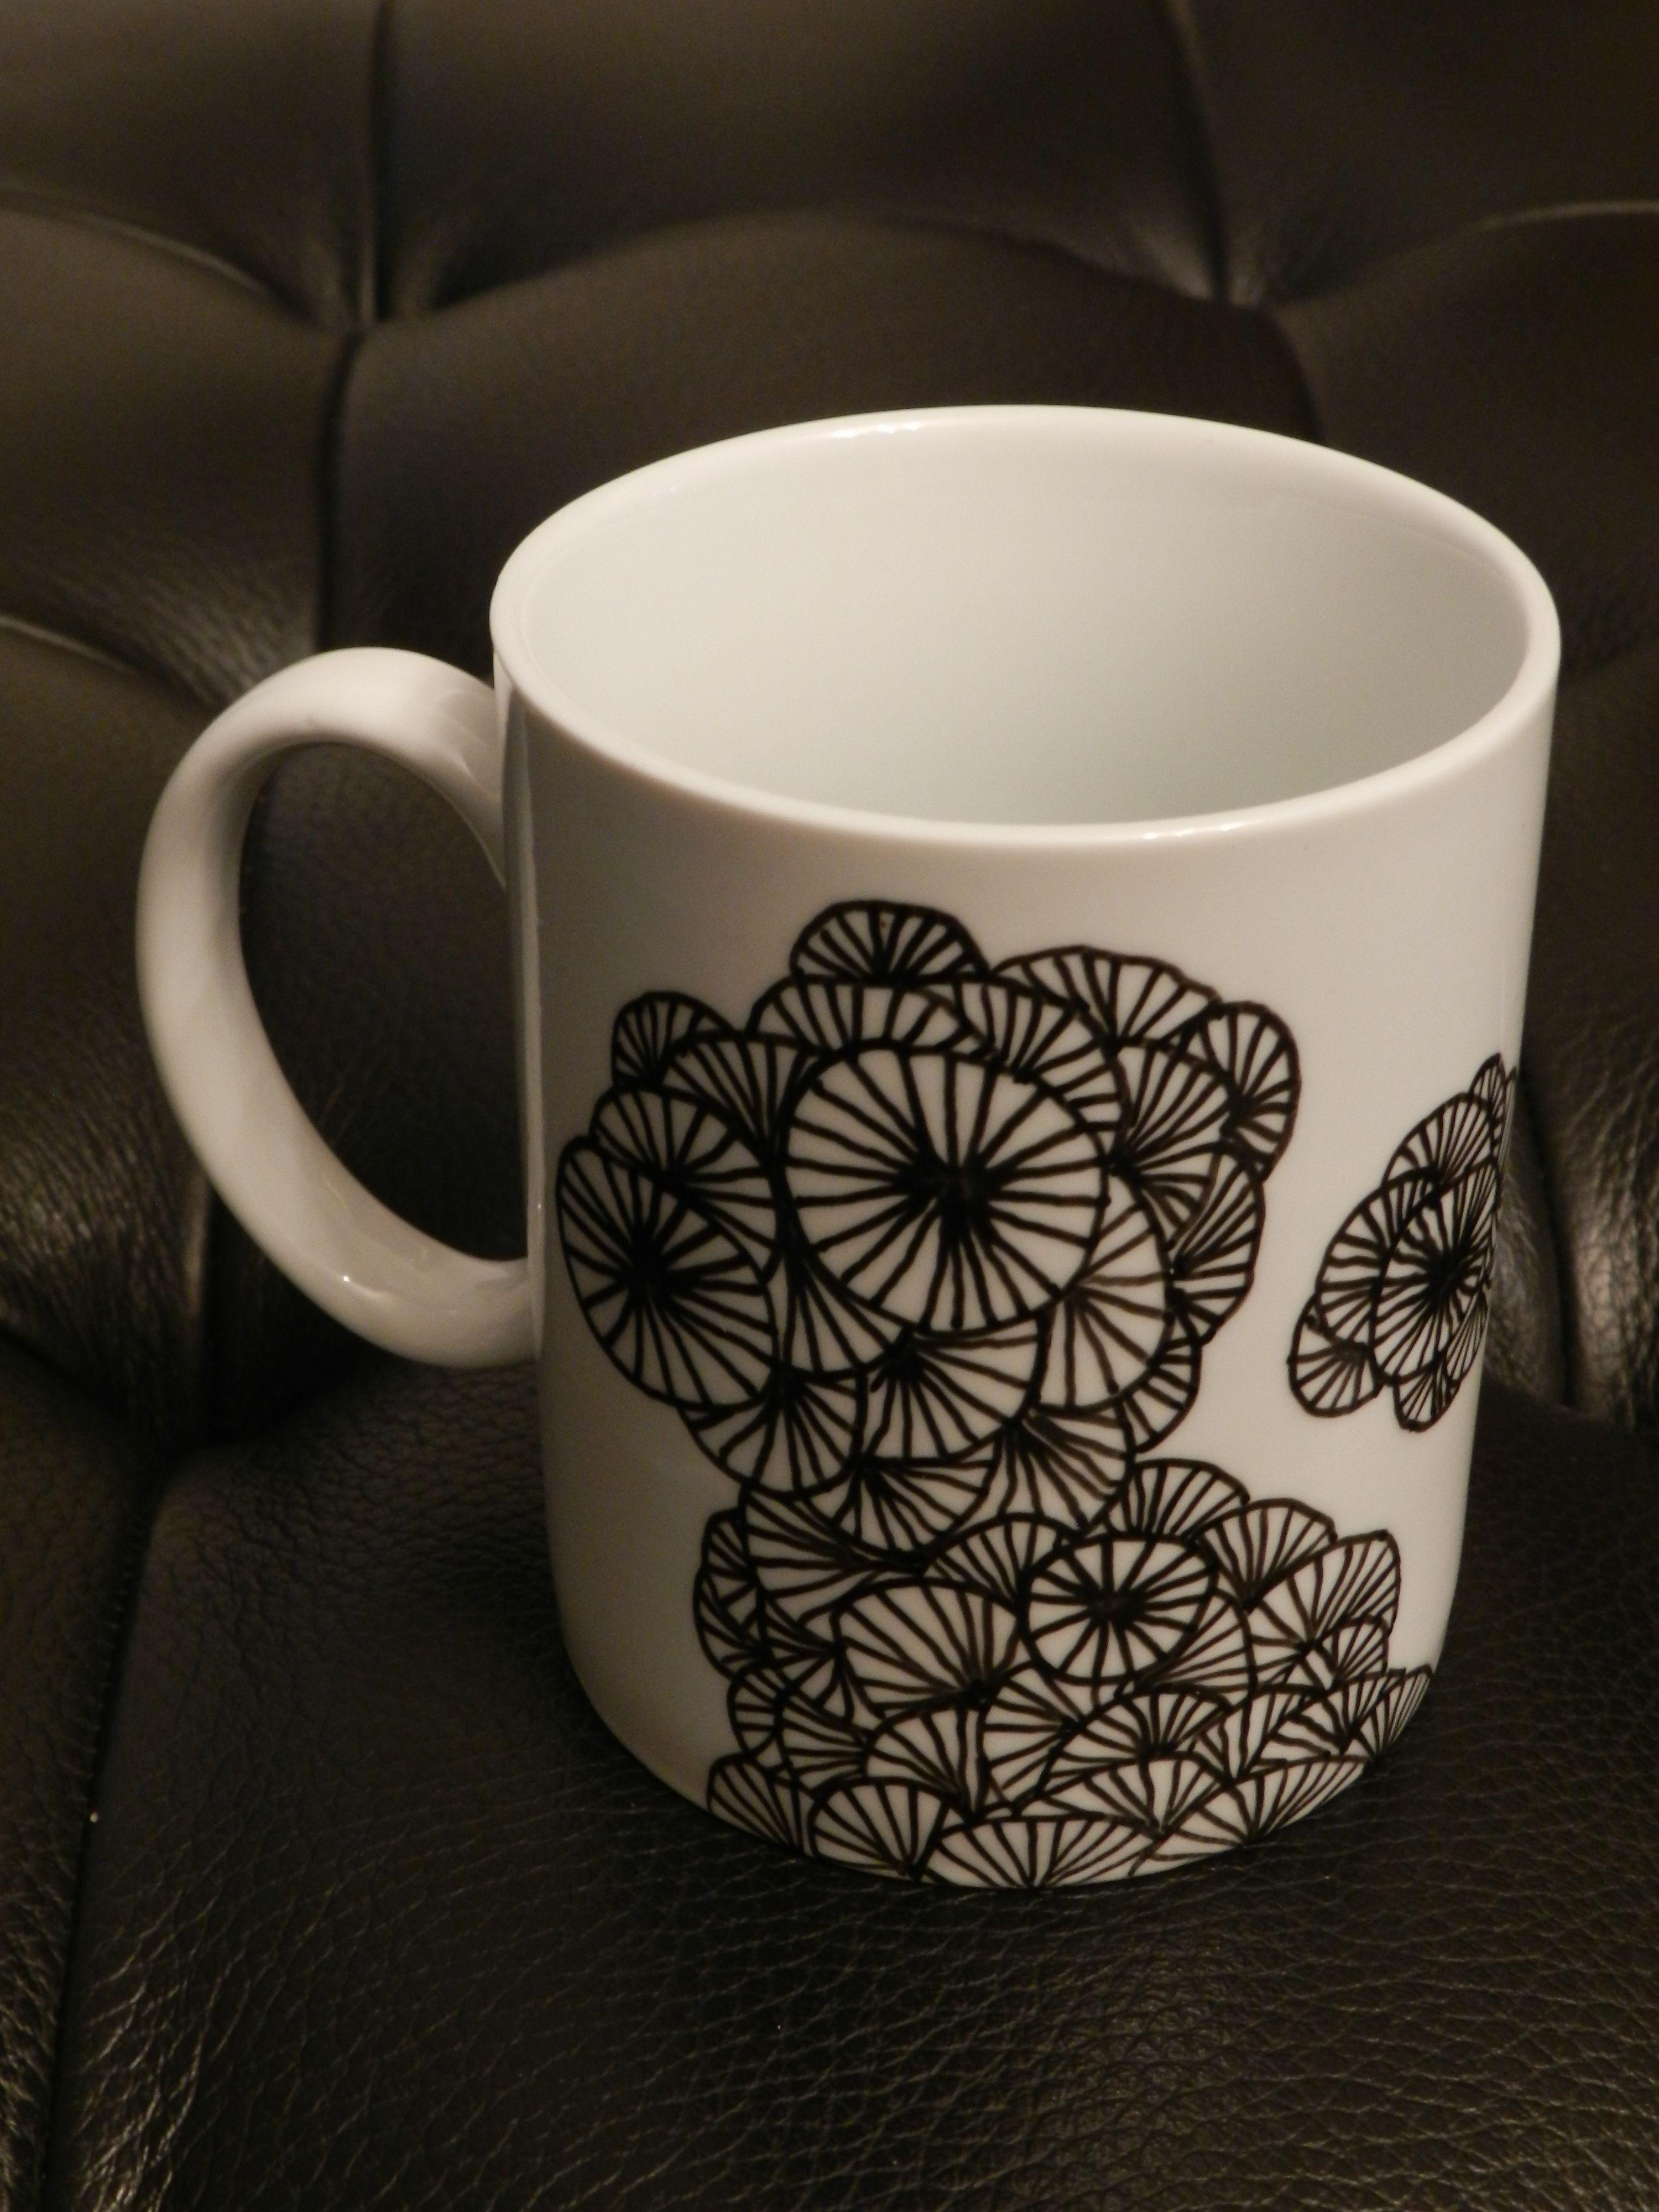 personnaliser son mug un mug personnaliser pour son papa. Black Bedroom Furniture Sets. Home Design Ideas